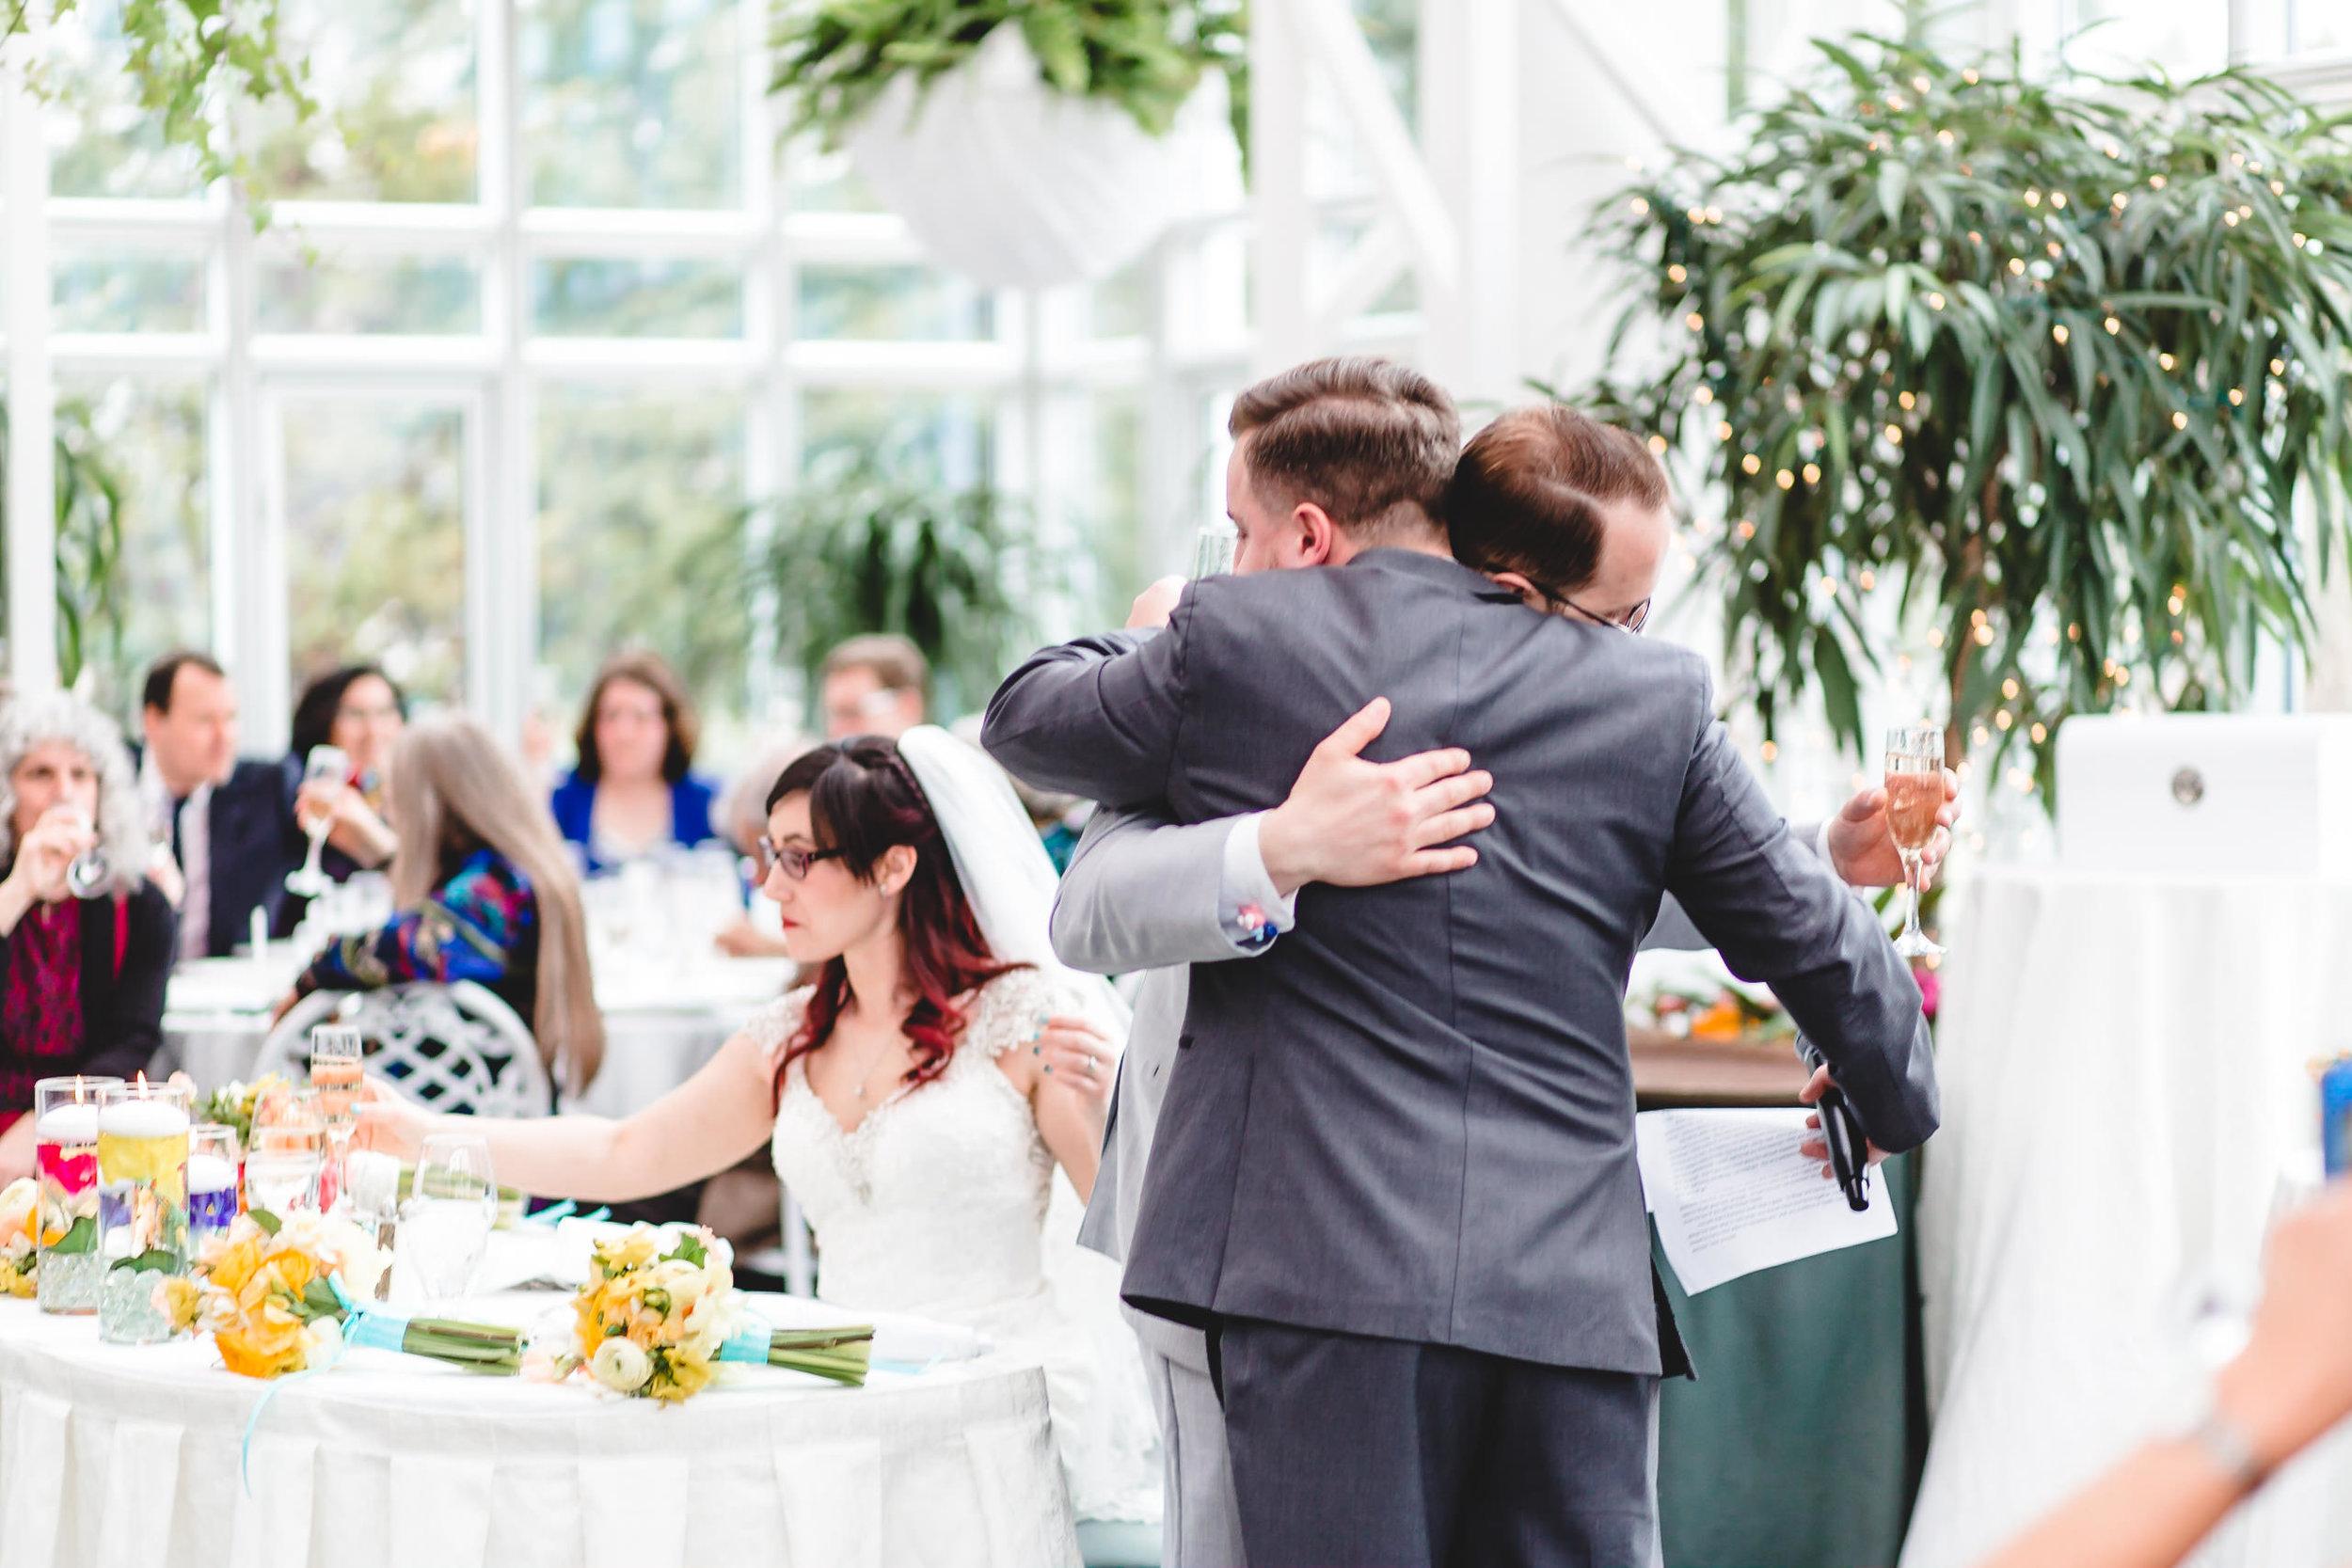 daniel_nydick_nj_photographer_headshot_wedding_event_family-25.jpg